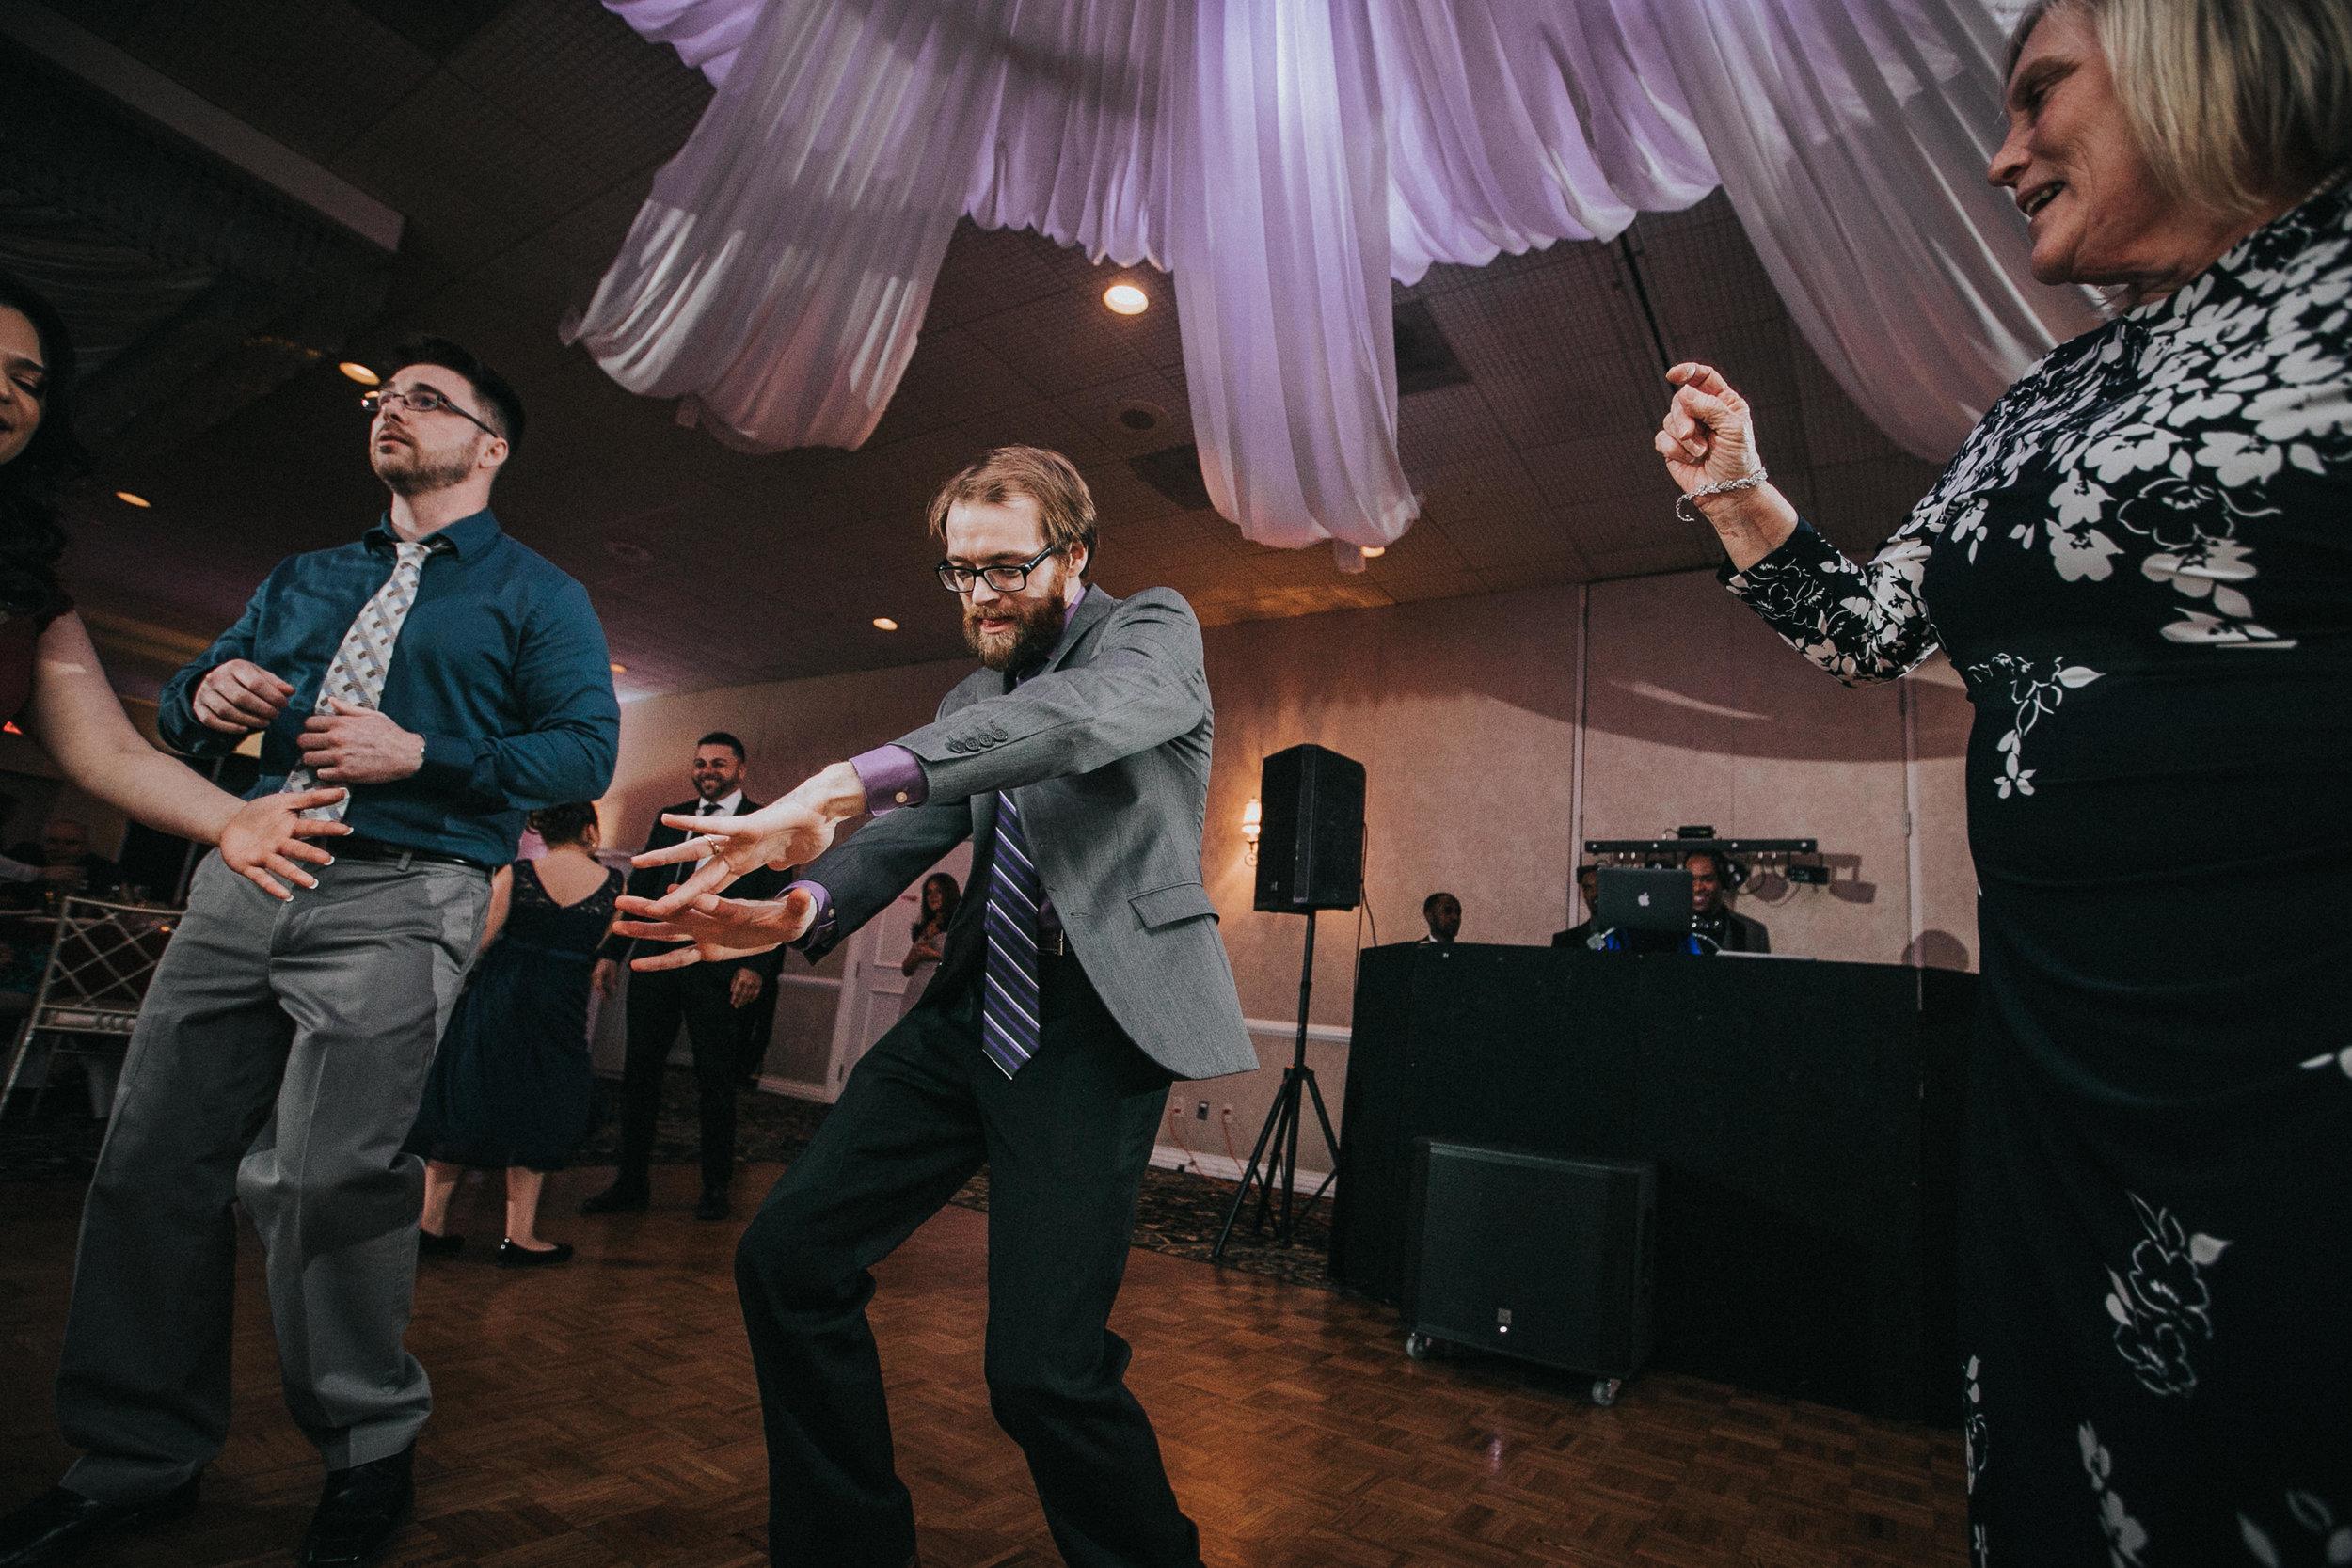 New-Jersey-Wedding-Photographer-ReceptionCenter-Valeria&Mike-Reception (24 of 265).jpg